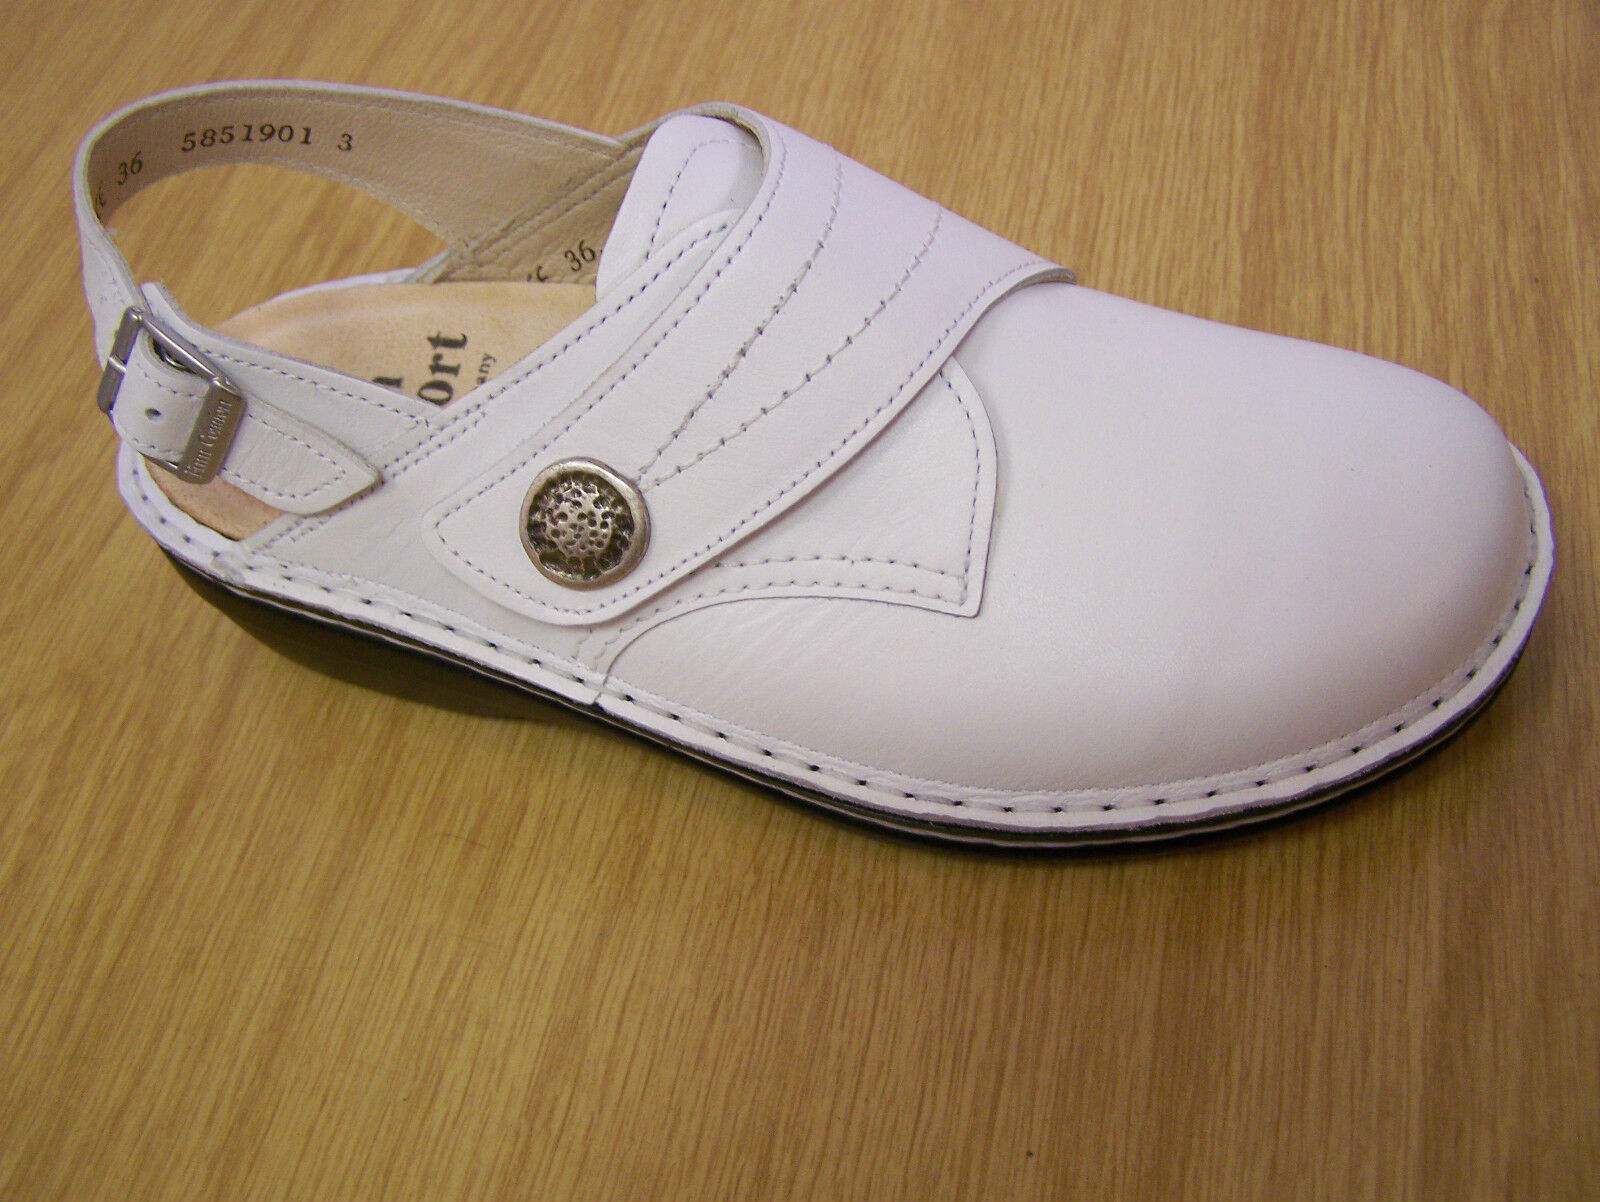 Finn Comfort veracruz-s avec en blanc avec veracruz-s bride softfu bett! incl. chaussure sac e7022c